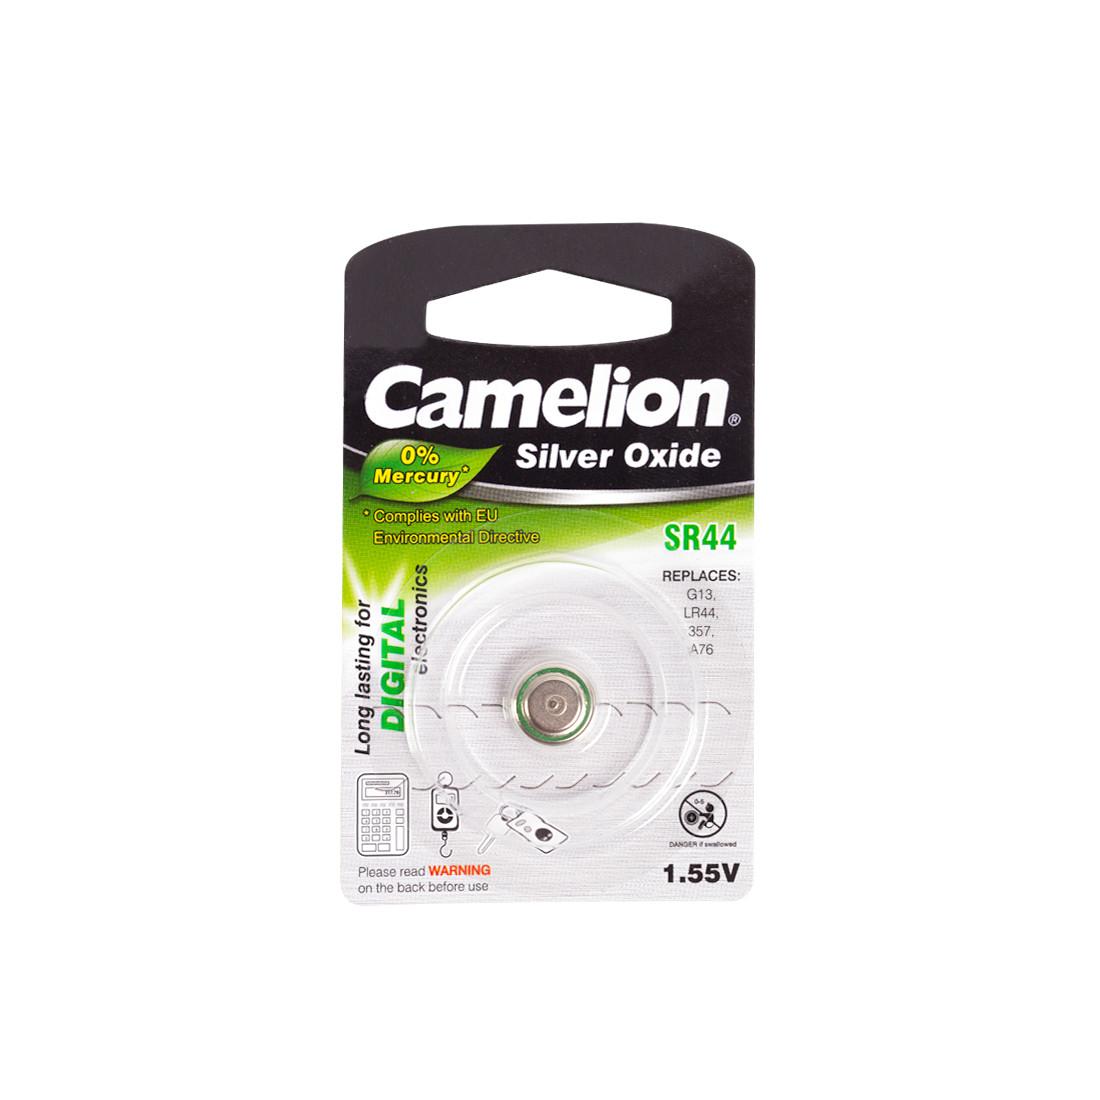 Батарейка CAMELION SR44-BP1(0%Hg)  Silver Oxide 1.55V 0% Ртути 1 шт. Блистер